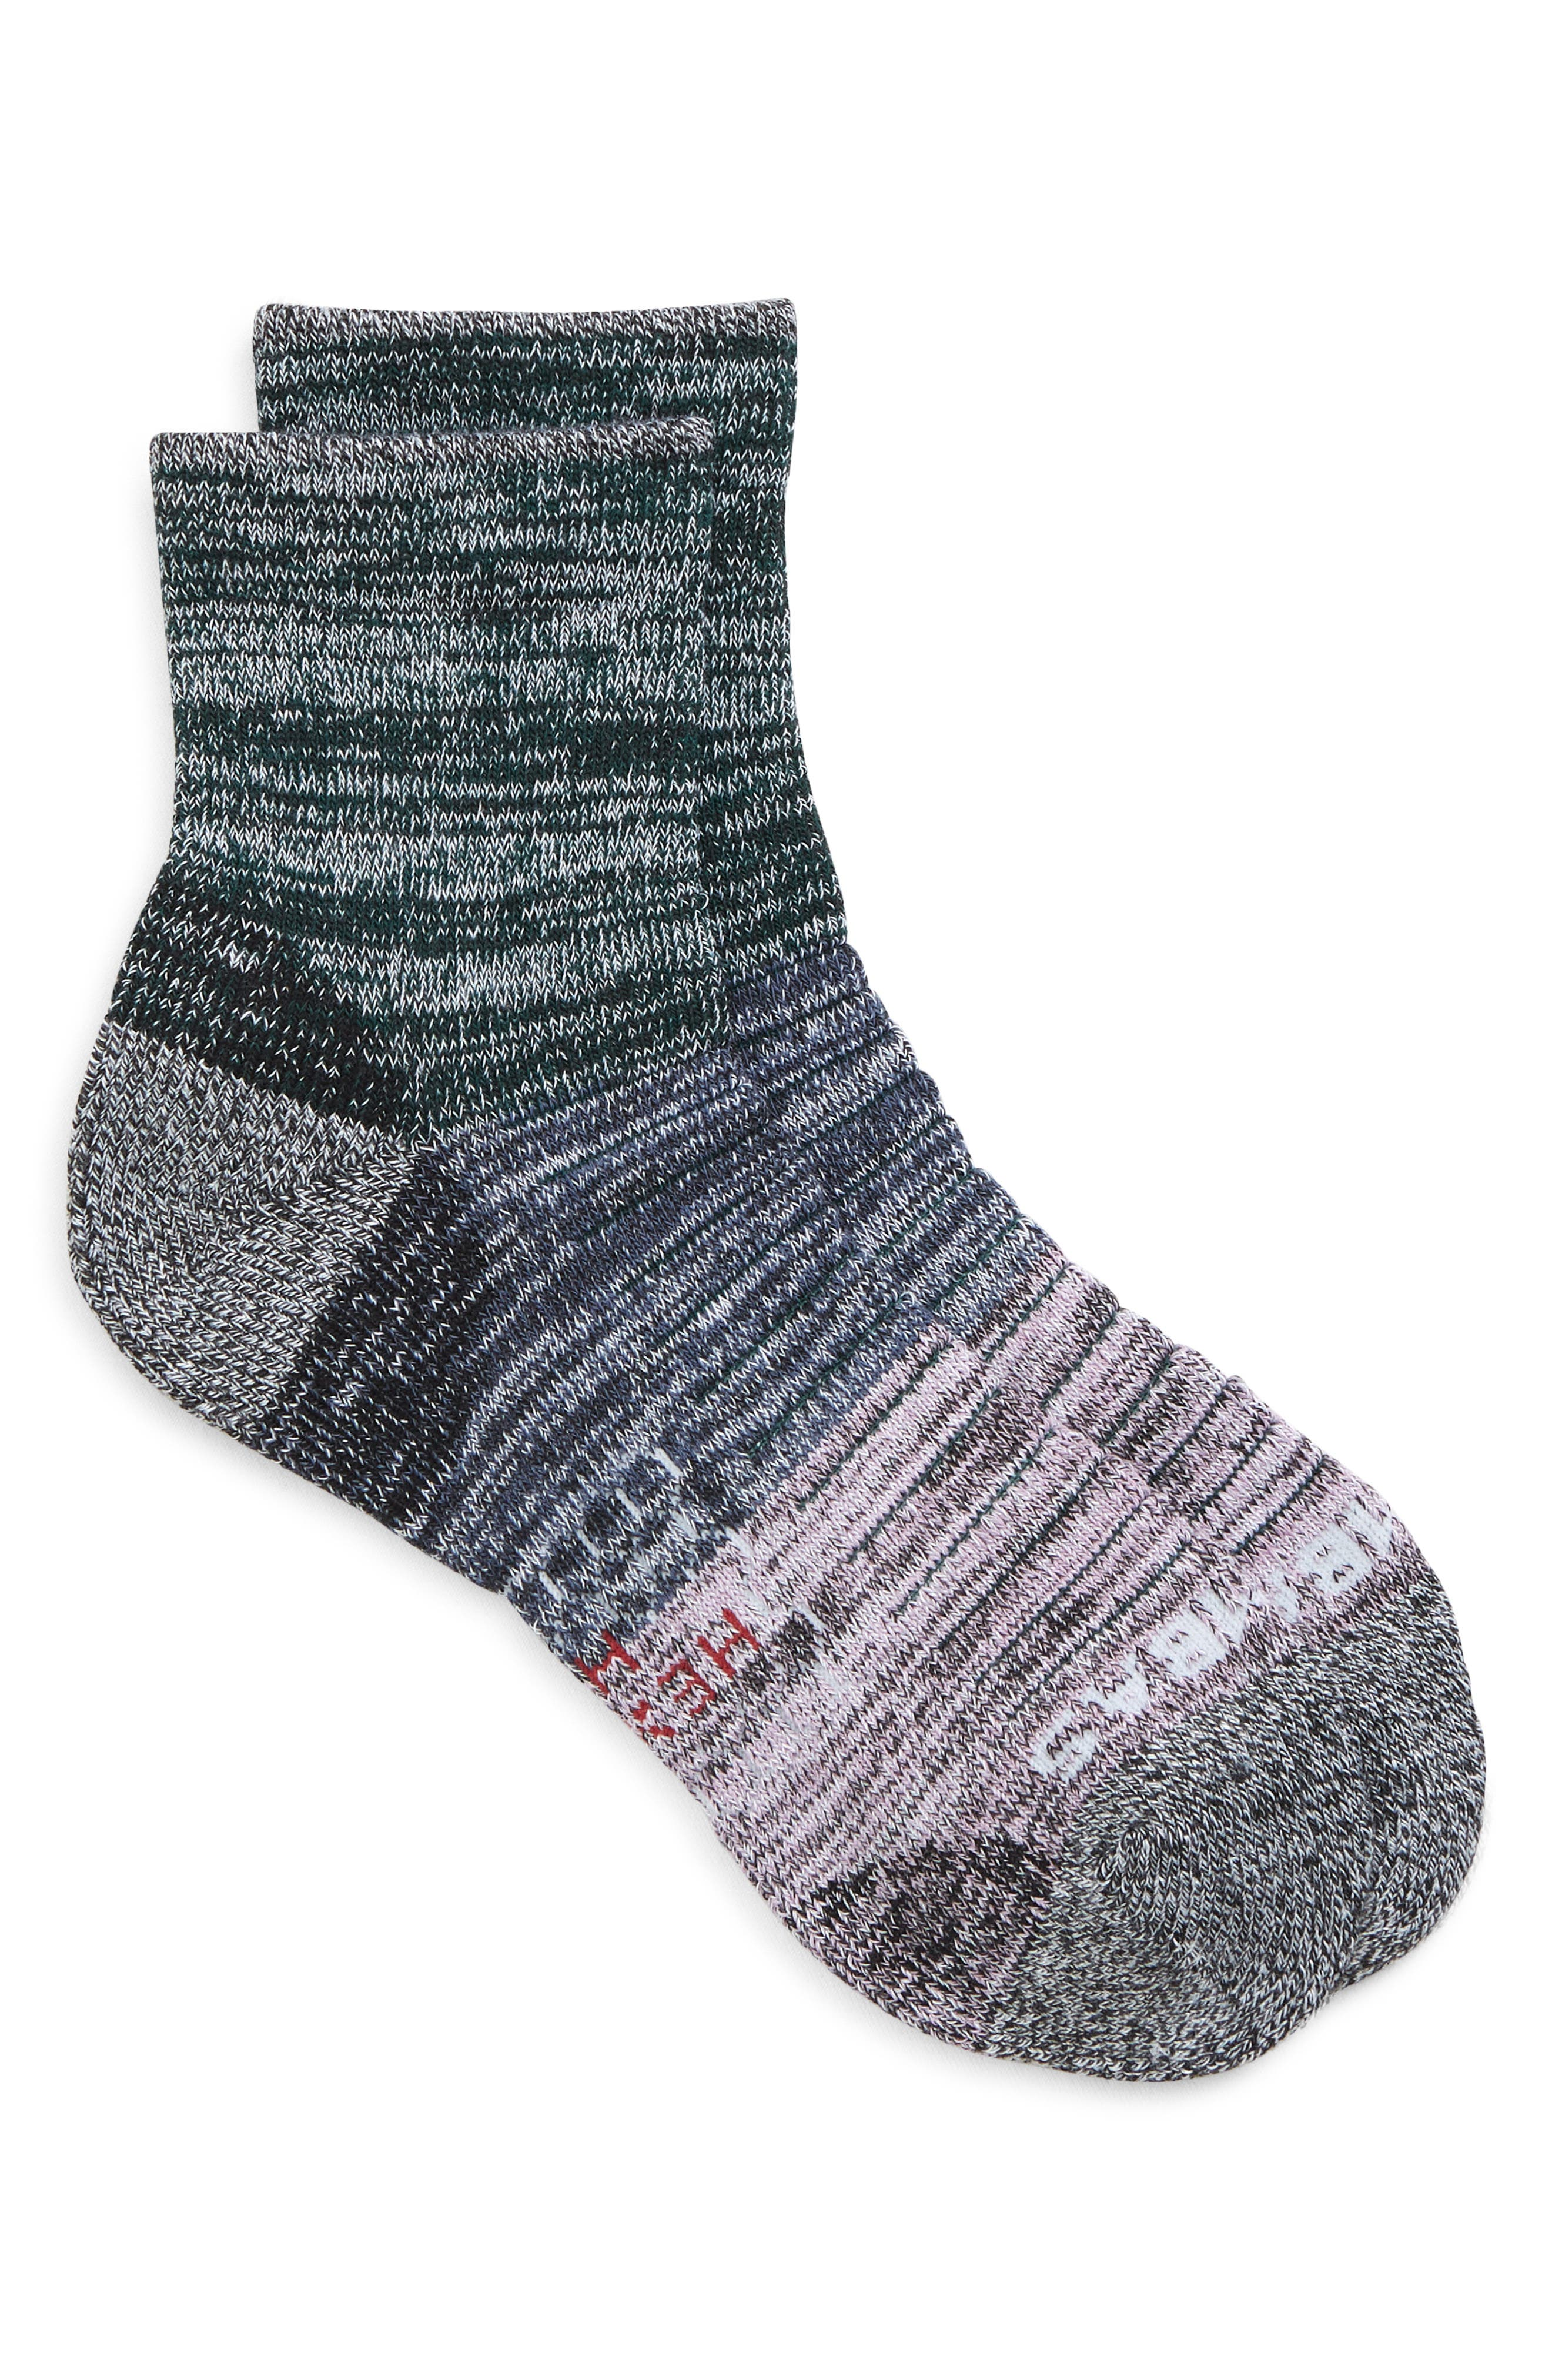 Performance Hiking Quarter Socks